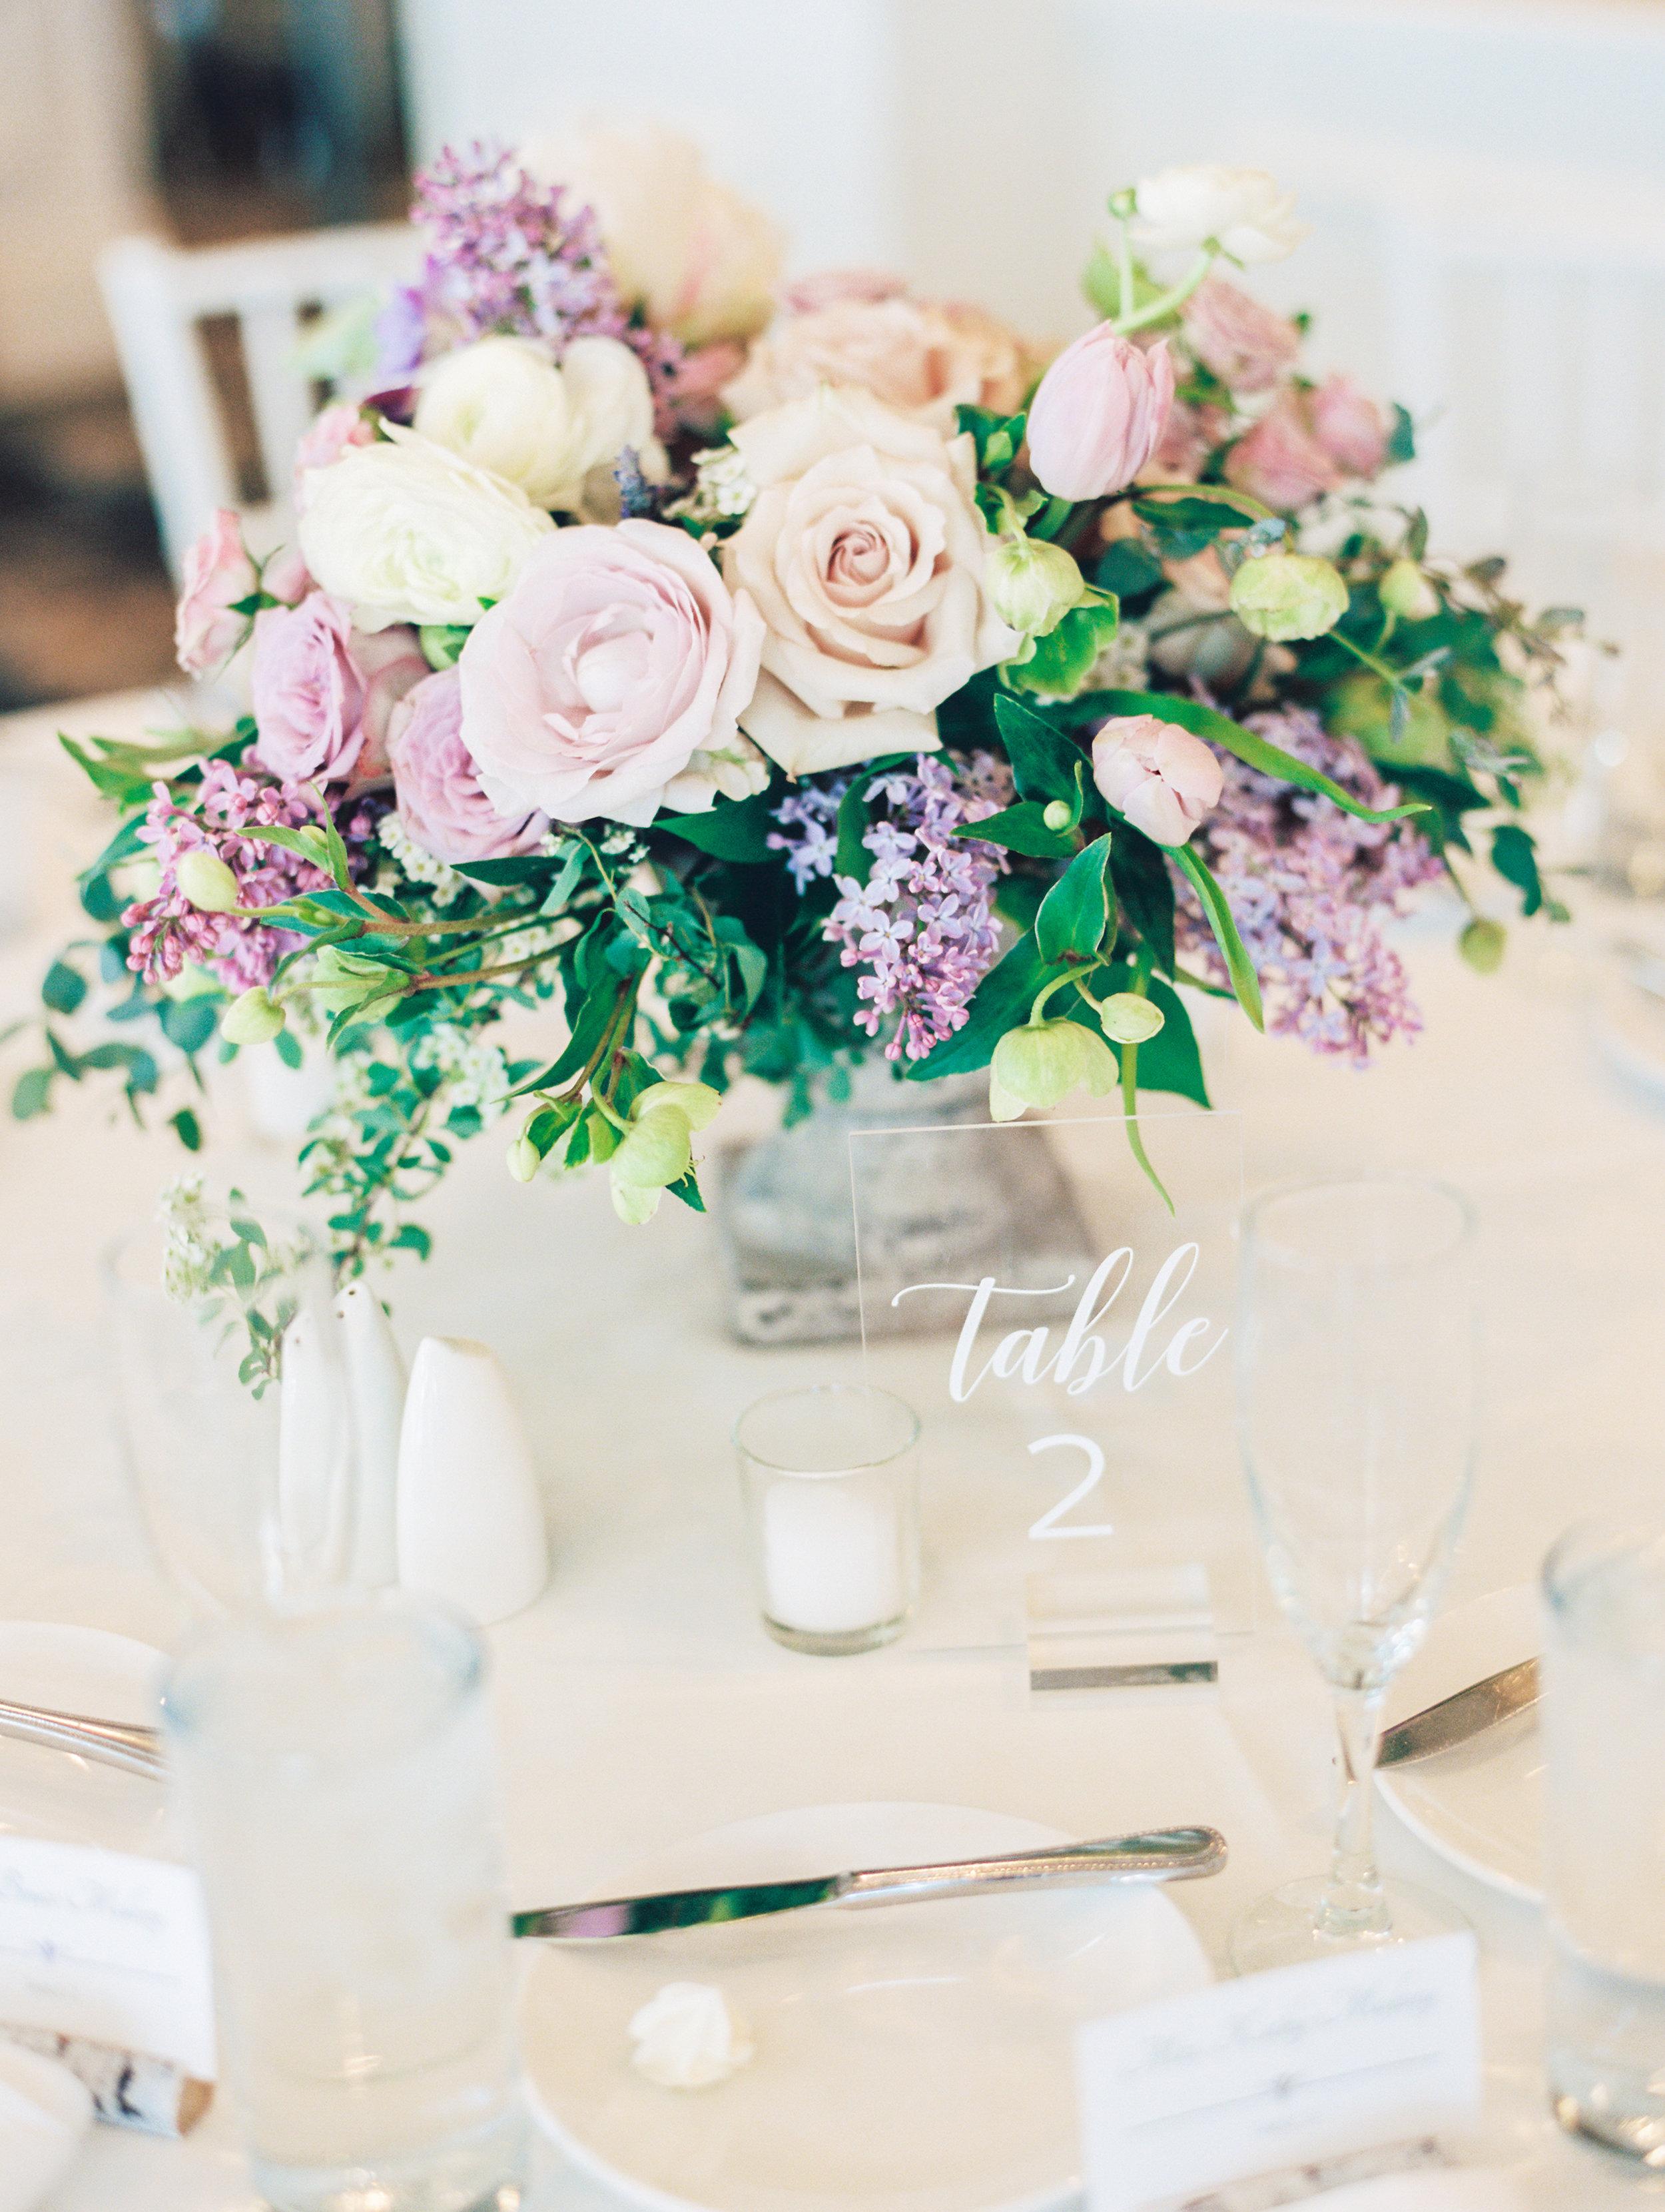 Noss+Wedding+Reception+Details-43.jpg